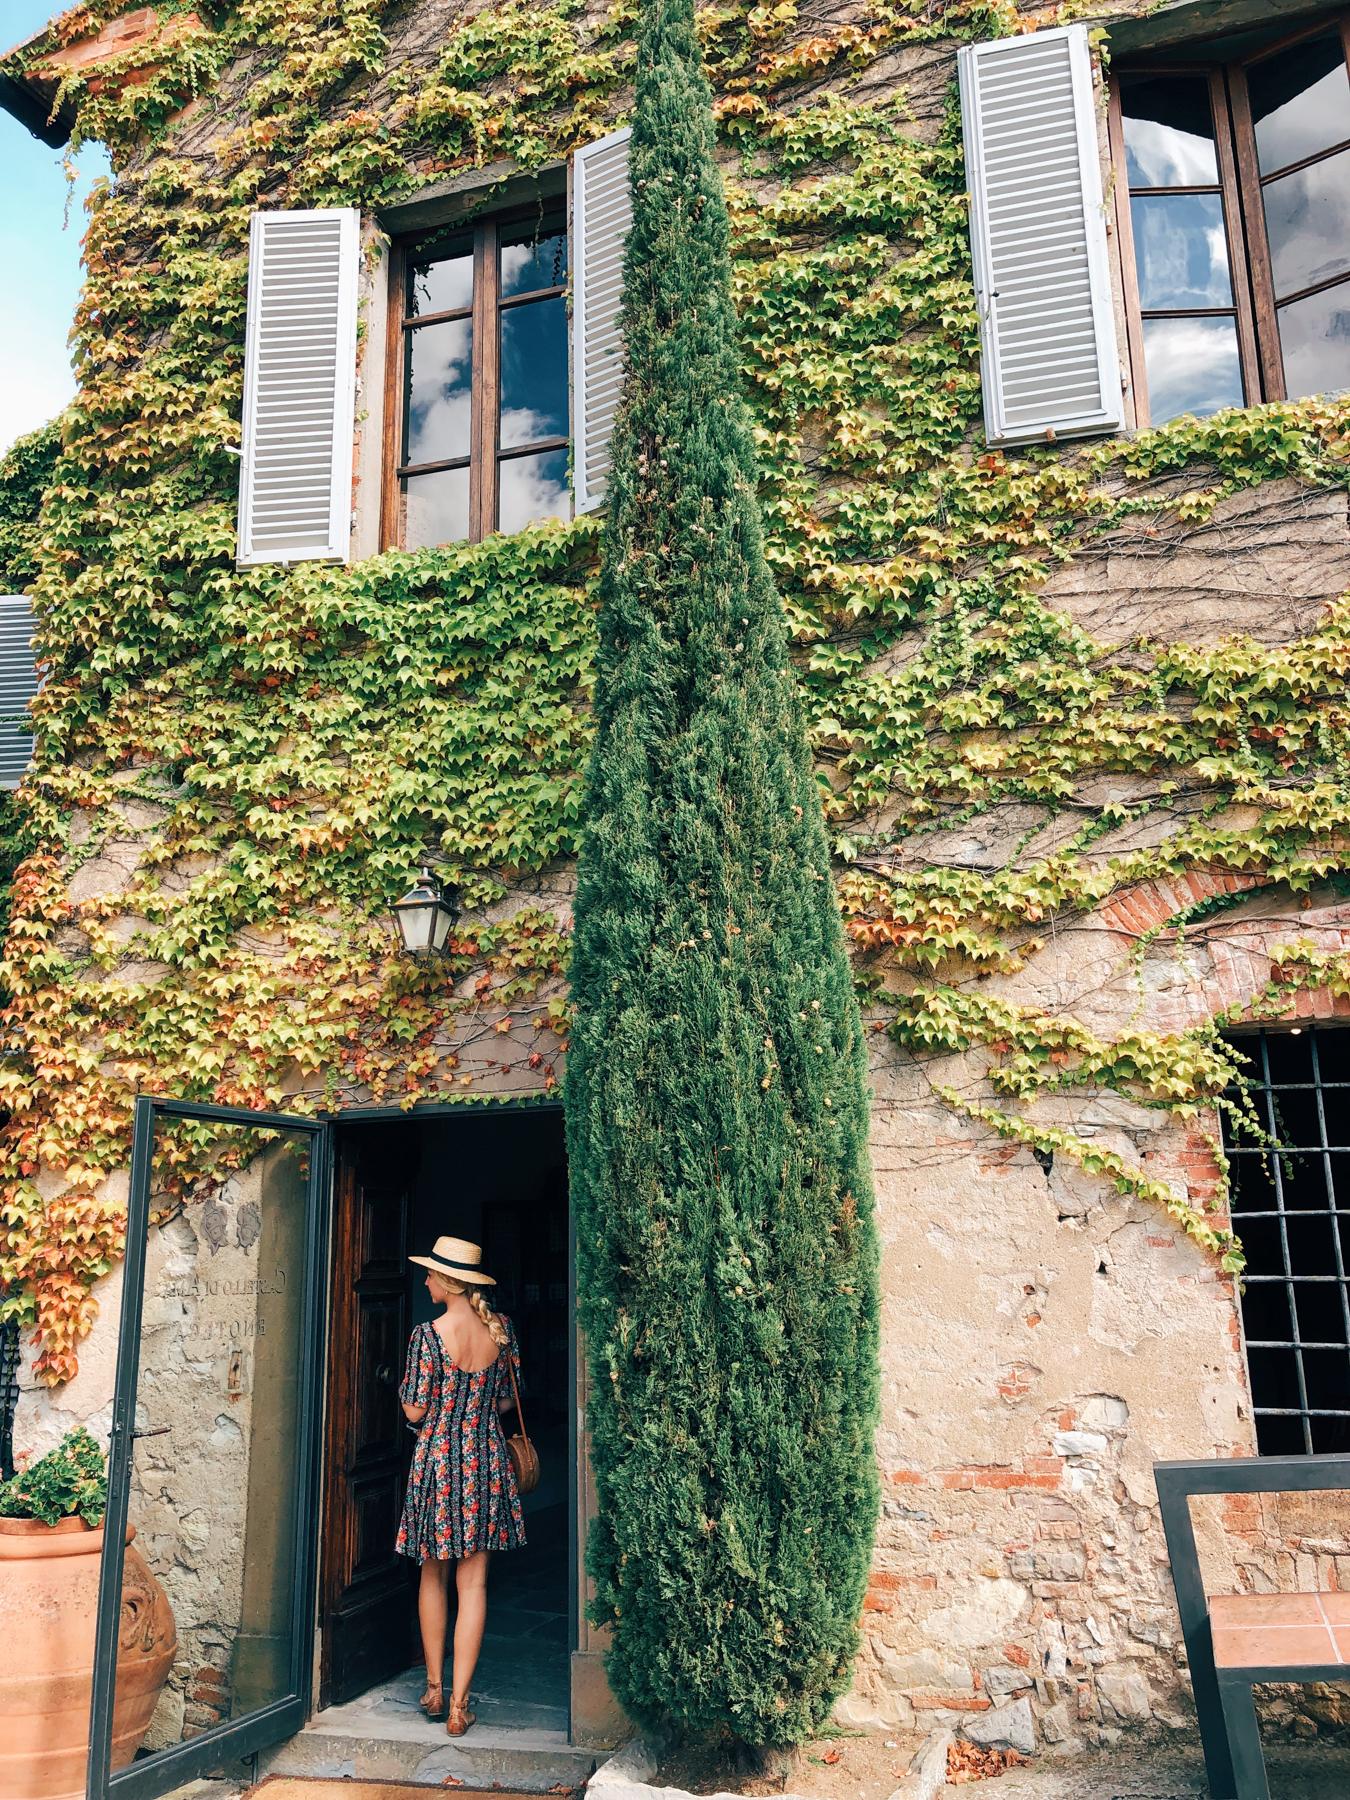 Entering the wine tasting room at Castello di Ama.